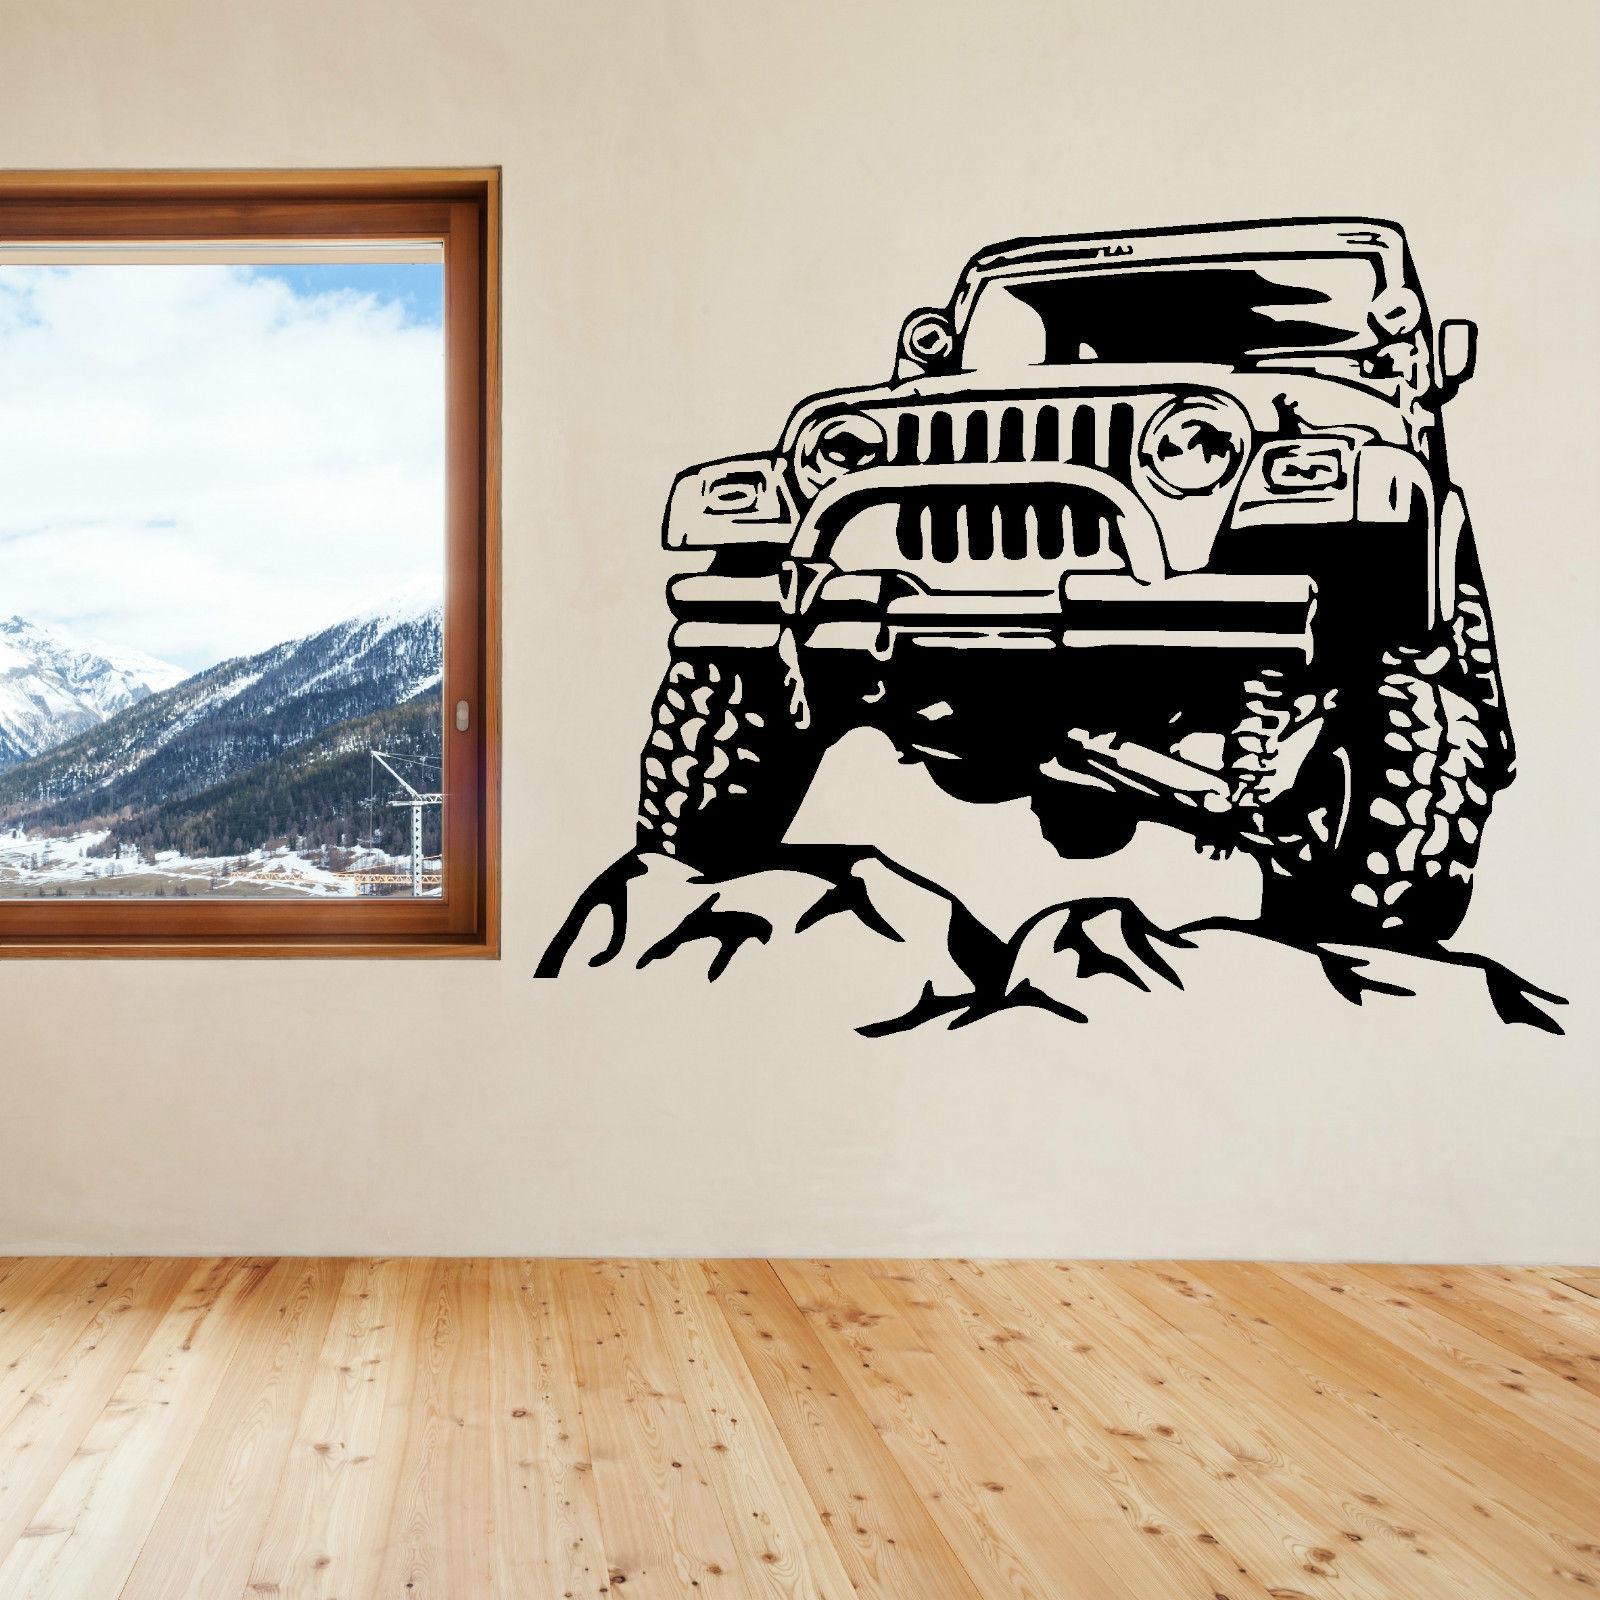 JEEP arte de pared removible vinilo etiqueta engomada etiqueta envío gratuito